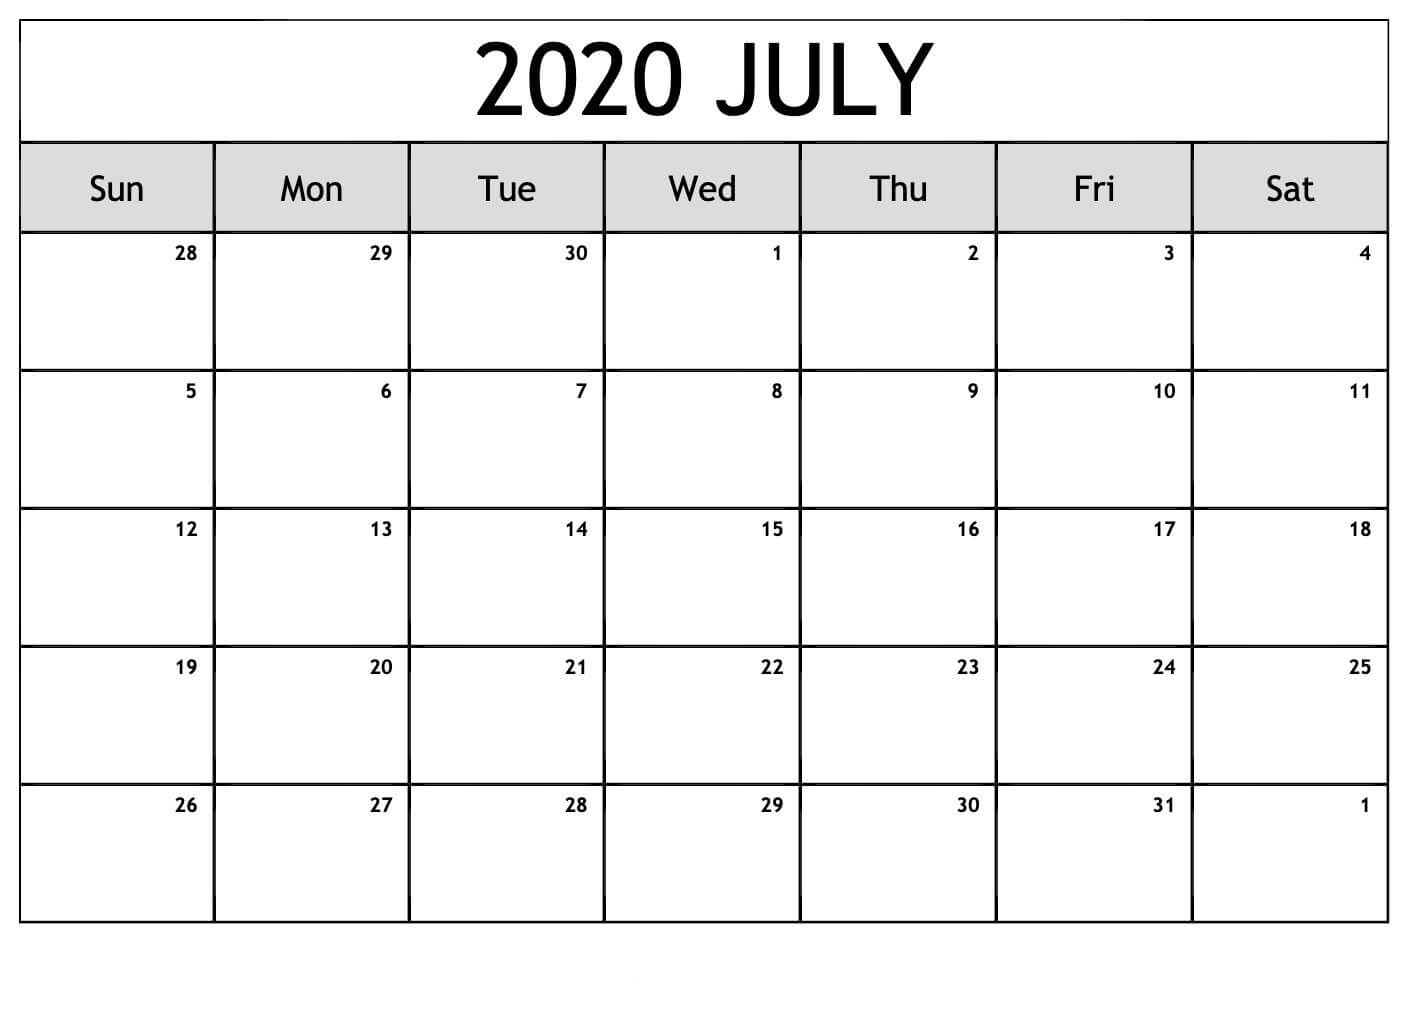 Calendar For 2020 July